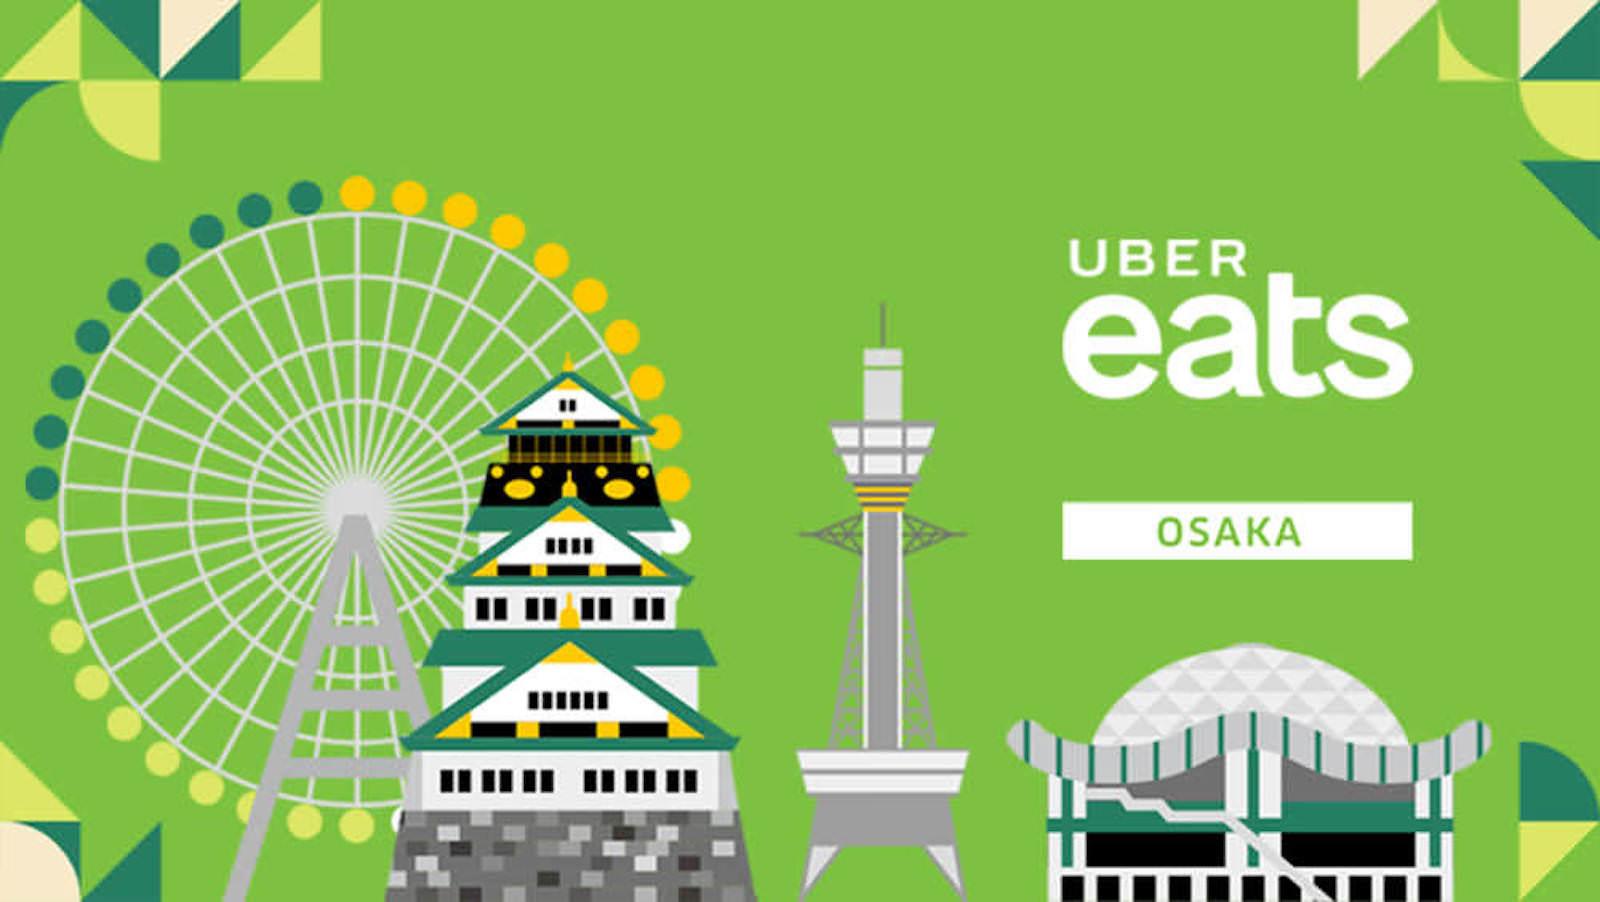 Uber-Eats-Osaka.jpg